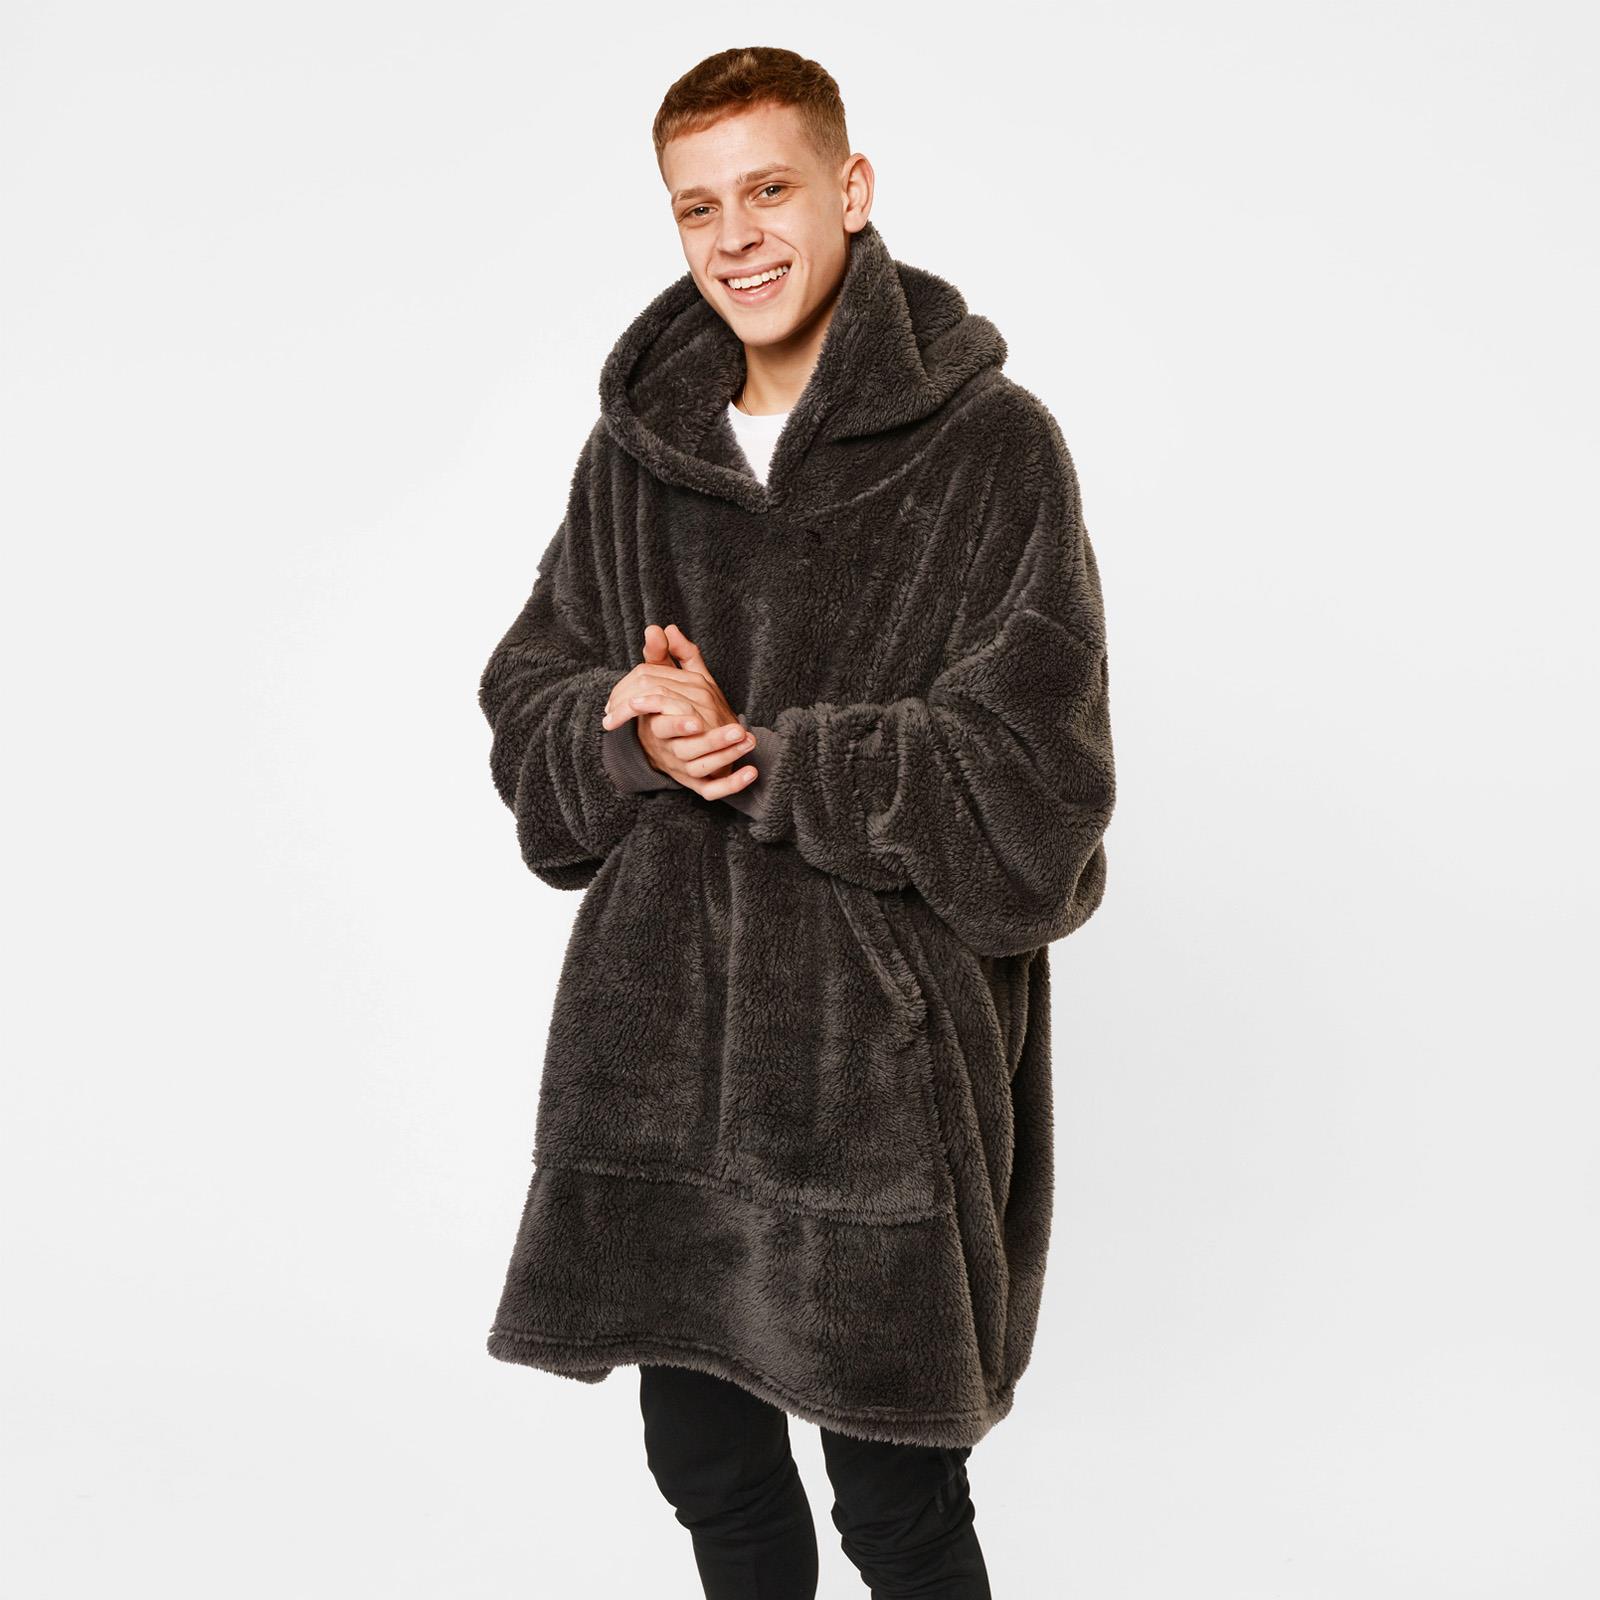 thumbnail 6 - Brentfords-Teddy-Fleece-Hoodie-Blanket-Oversized-Giant-Wearable-Adults-Kids-UK